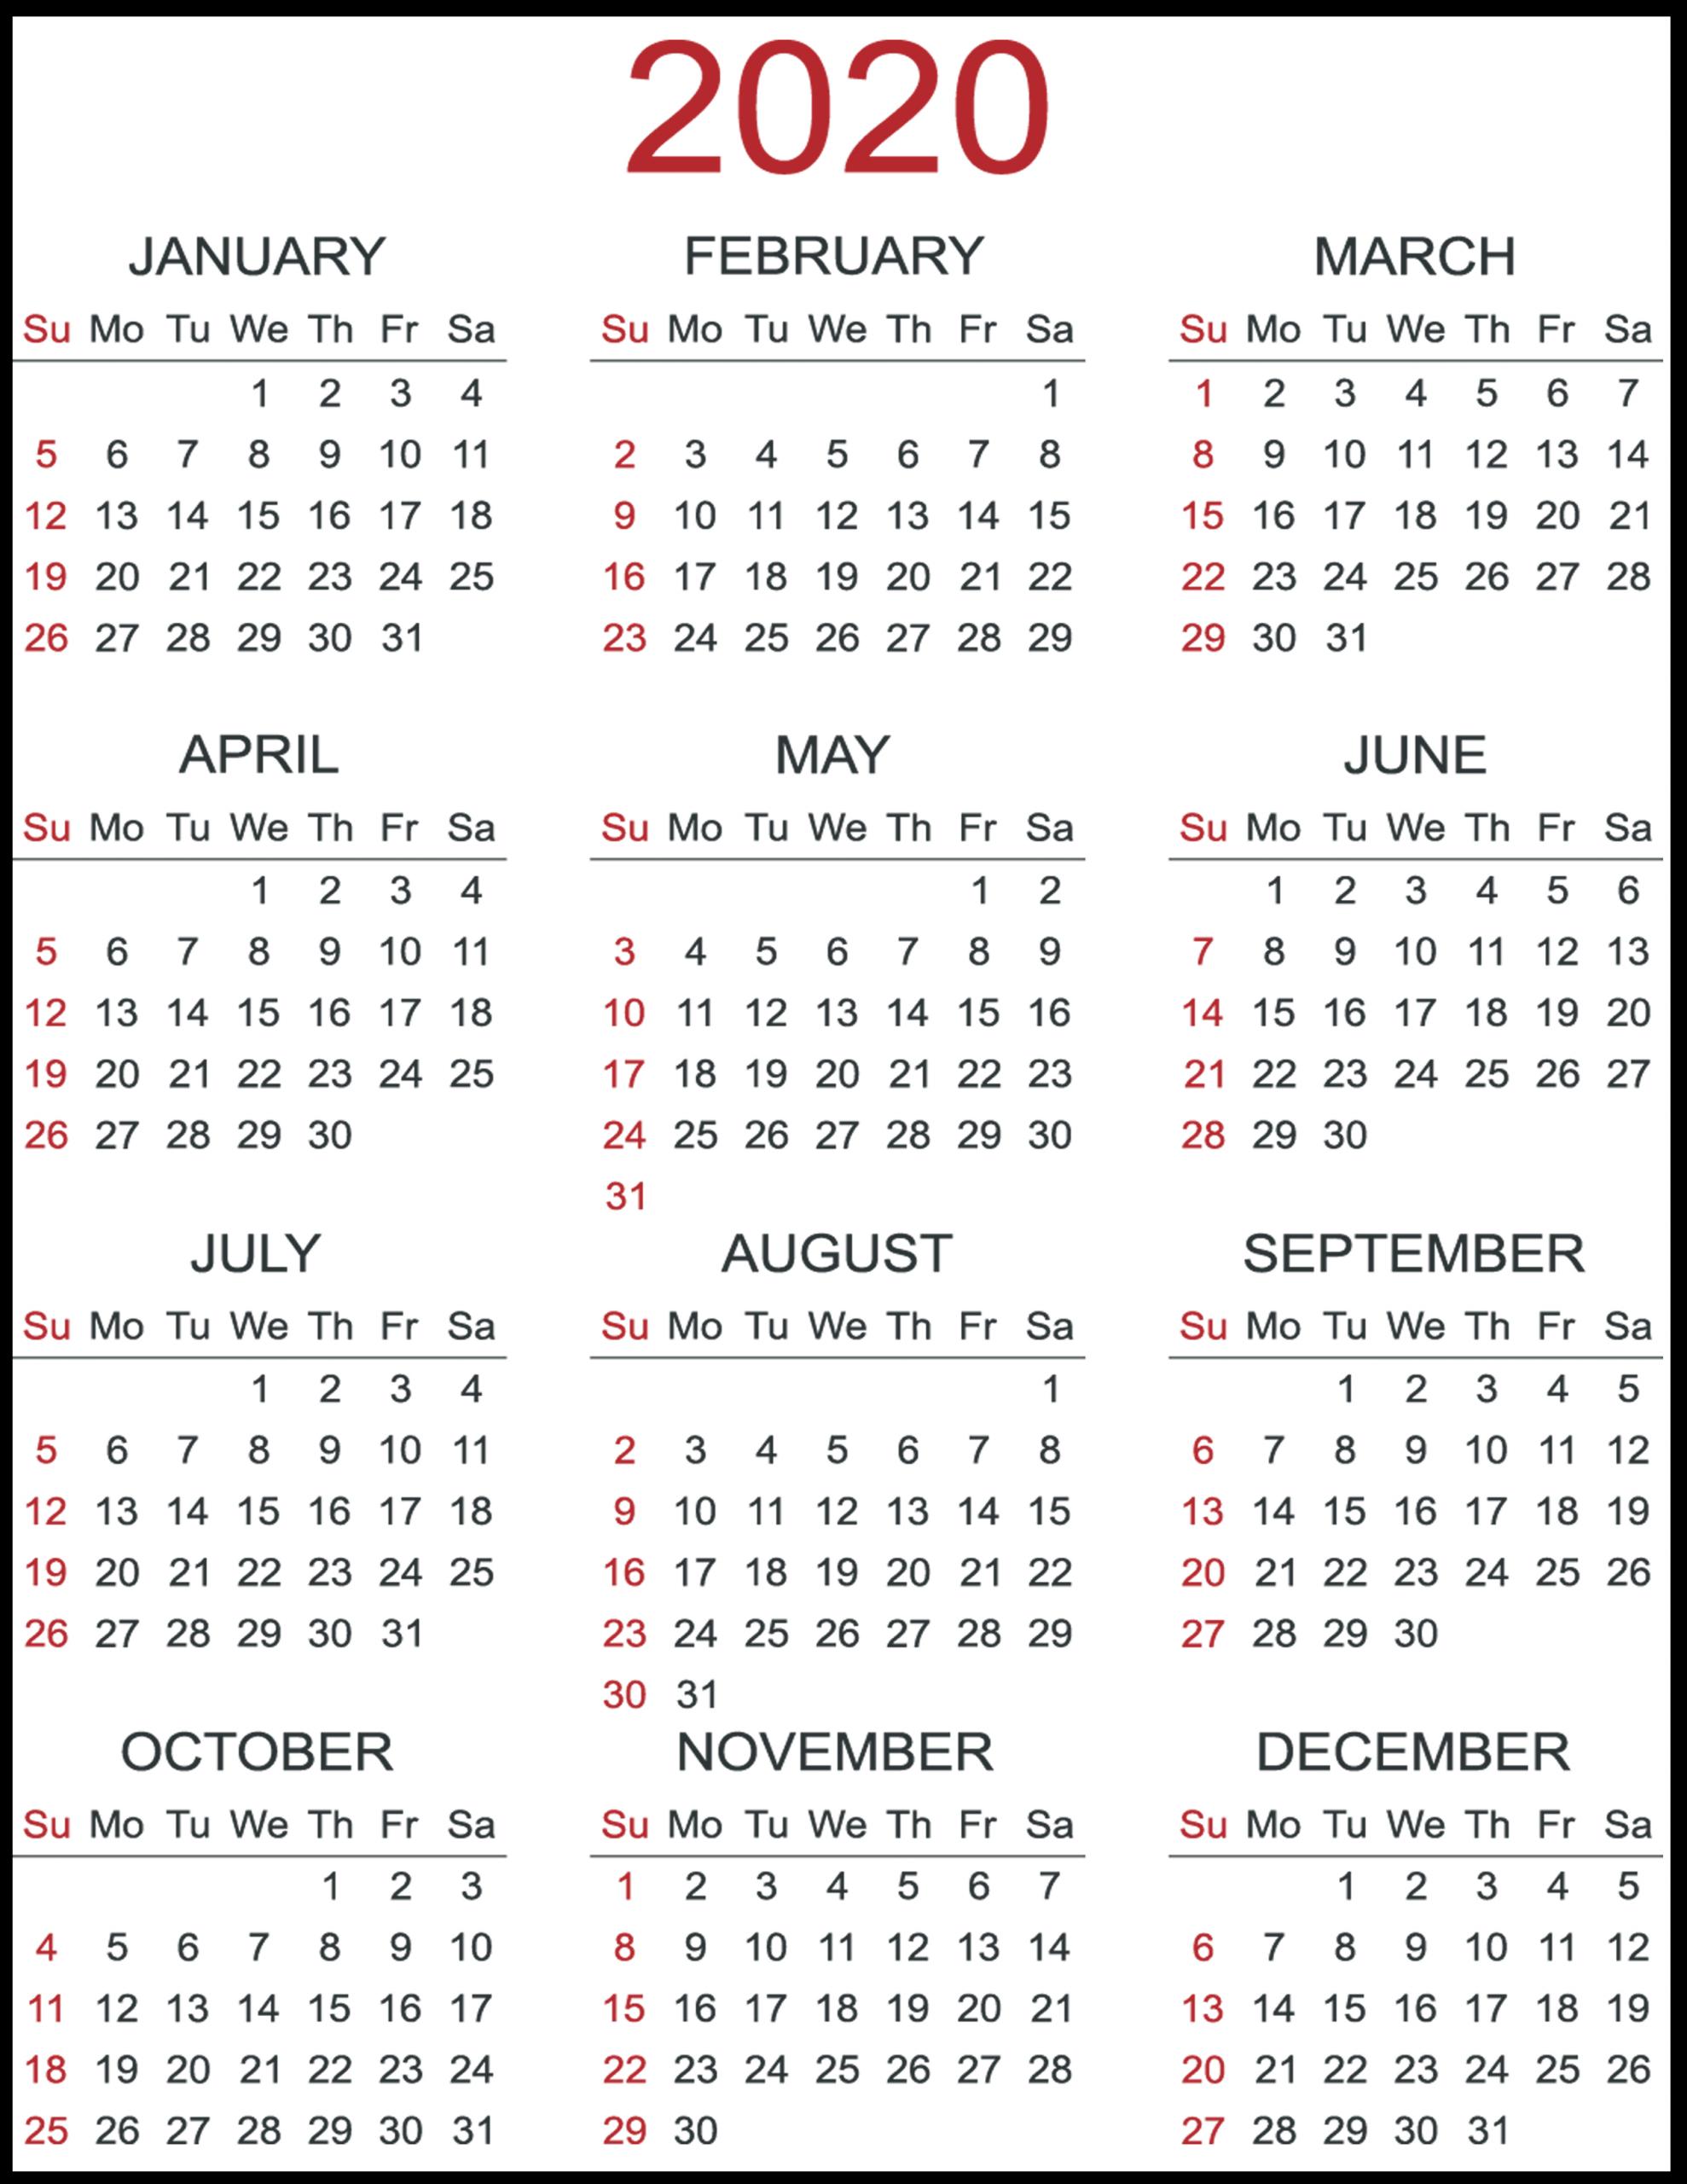 Free 2020 Yearly Printable Calendar Template | Calendar Wine